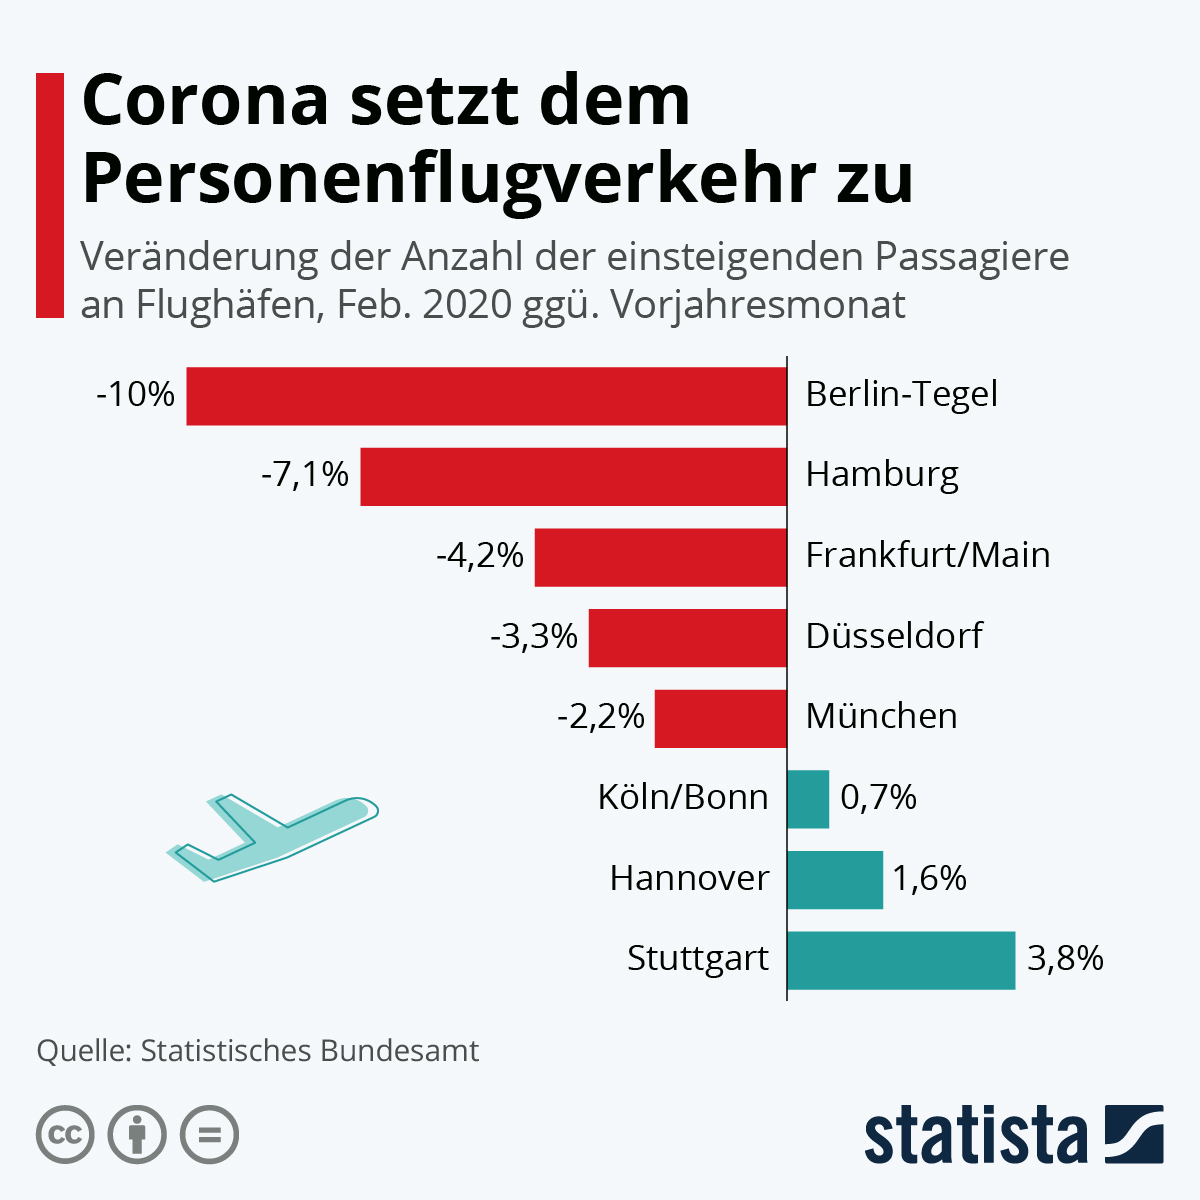 Infografik: Corona setzt dem Personenflugverkehr zu | Statista